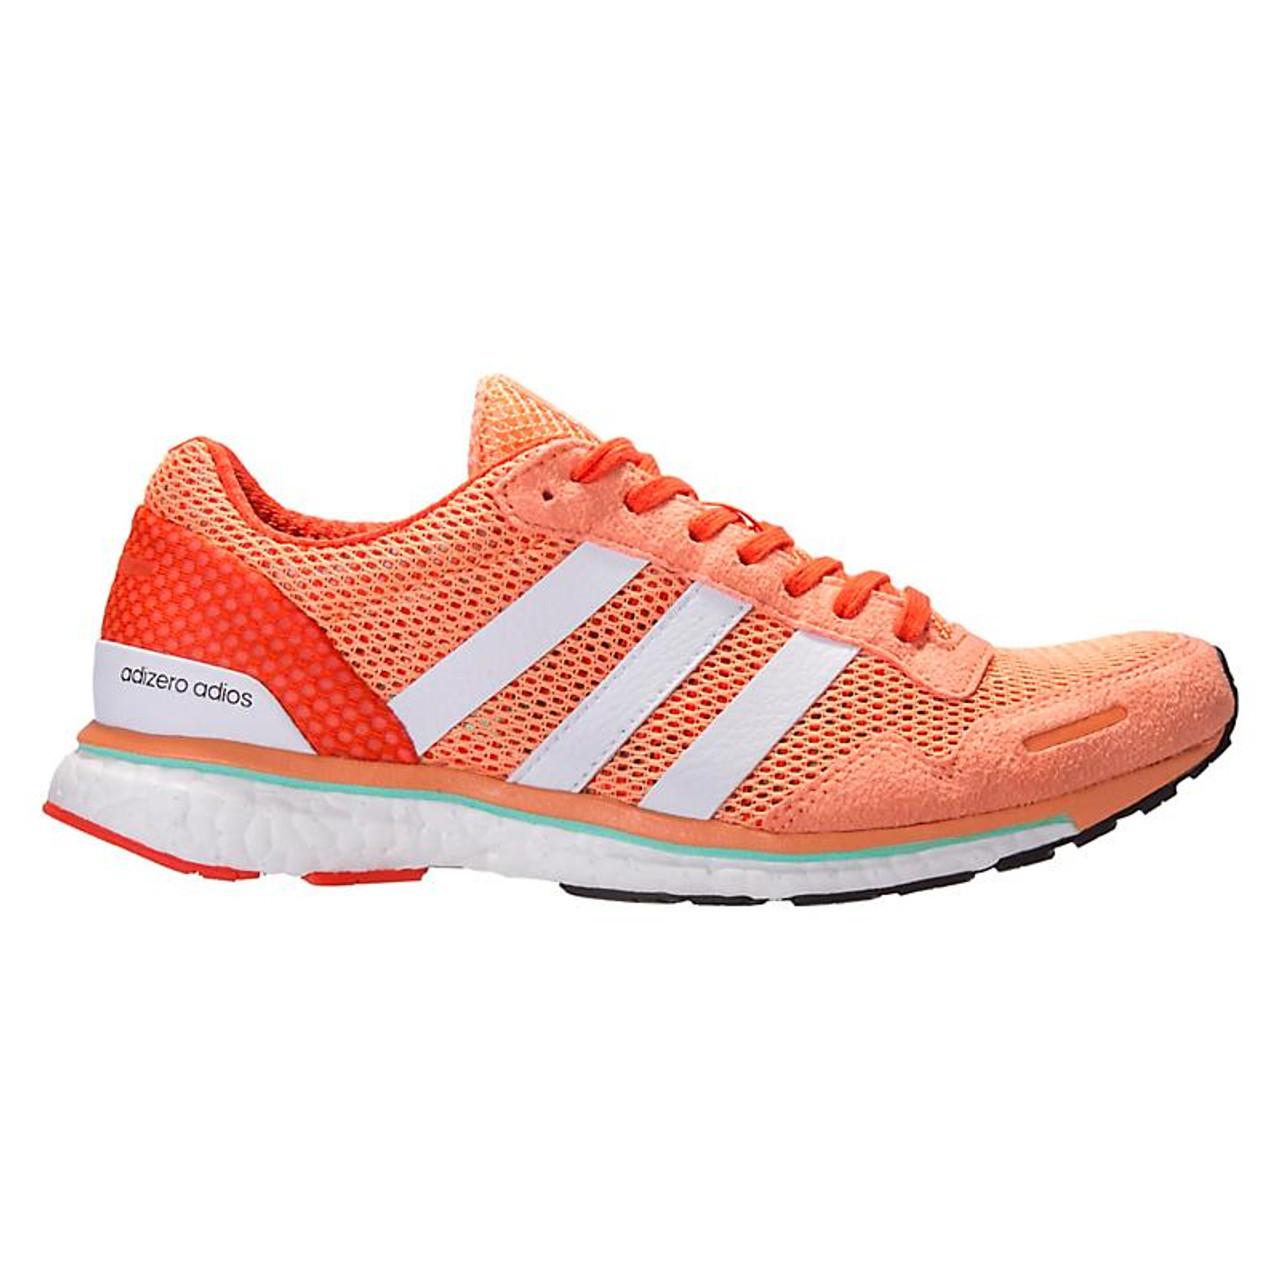 low priced b6125 71253 ... Womens adidas Adizero Adios 3. Sale